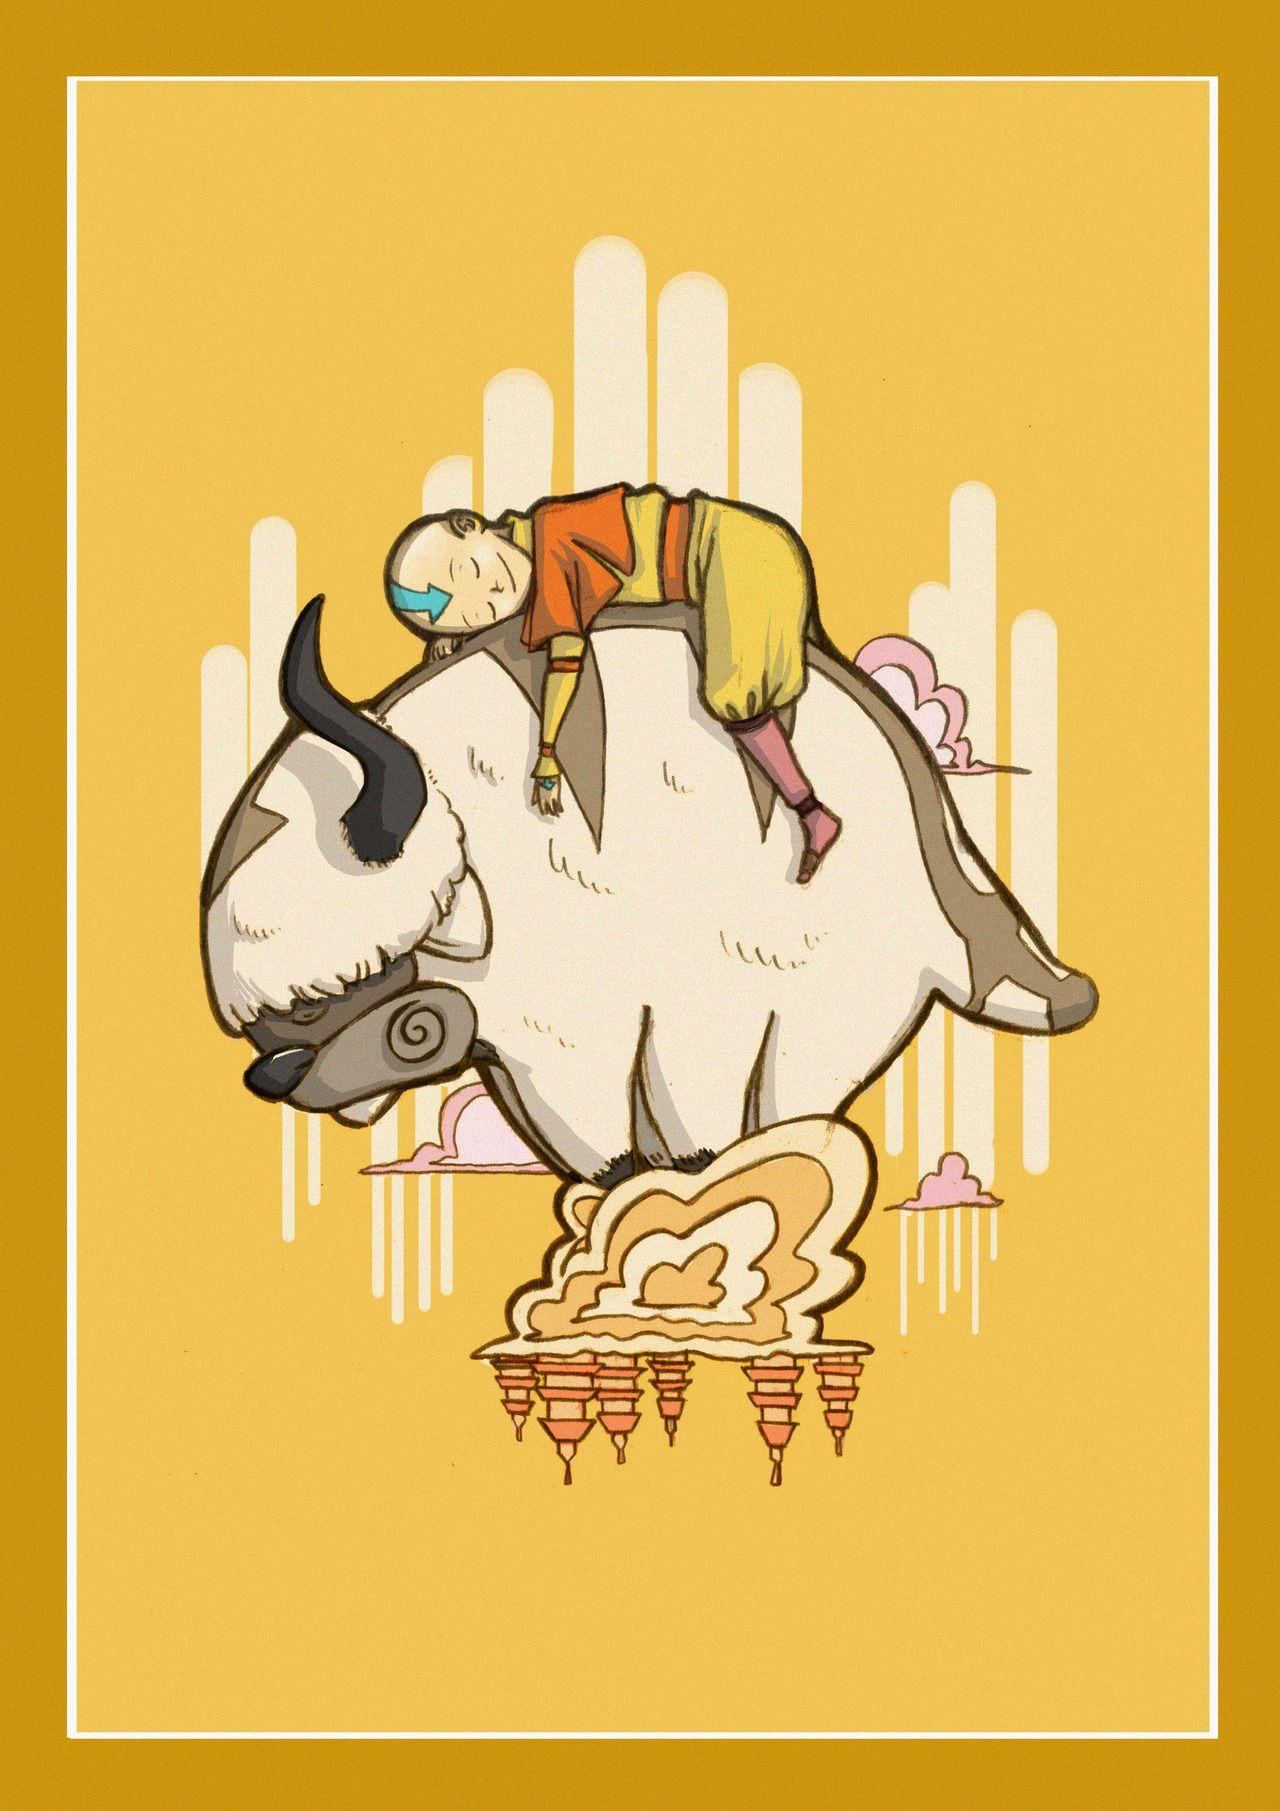 Aang and Appa fan art poster by Artie (Phish) Fartie.